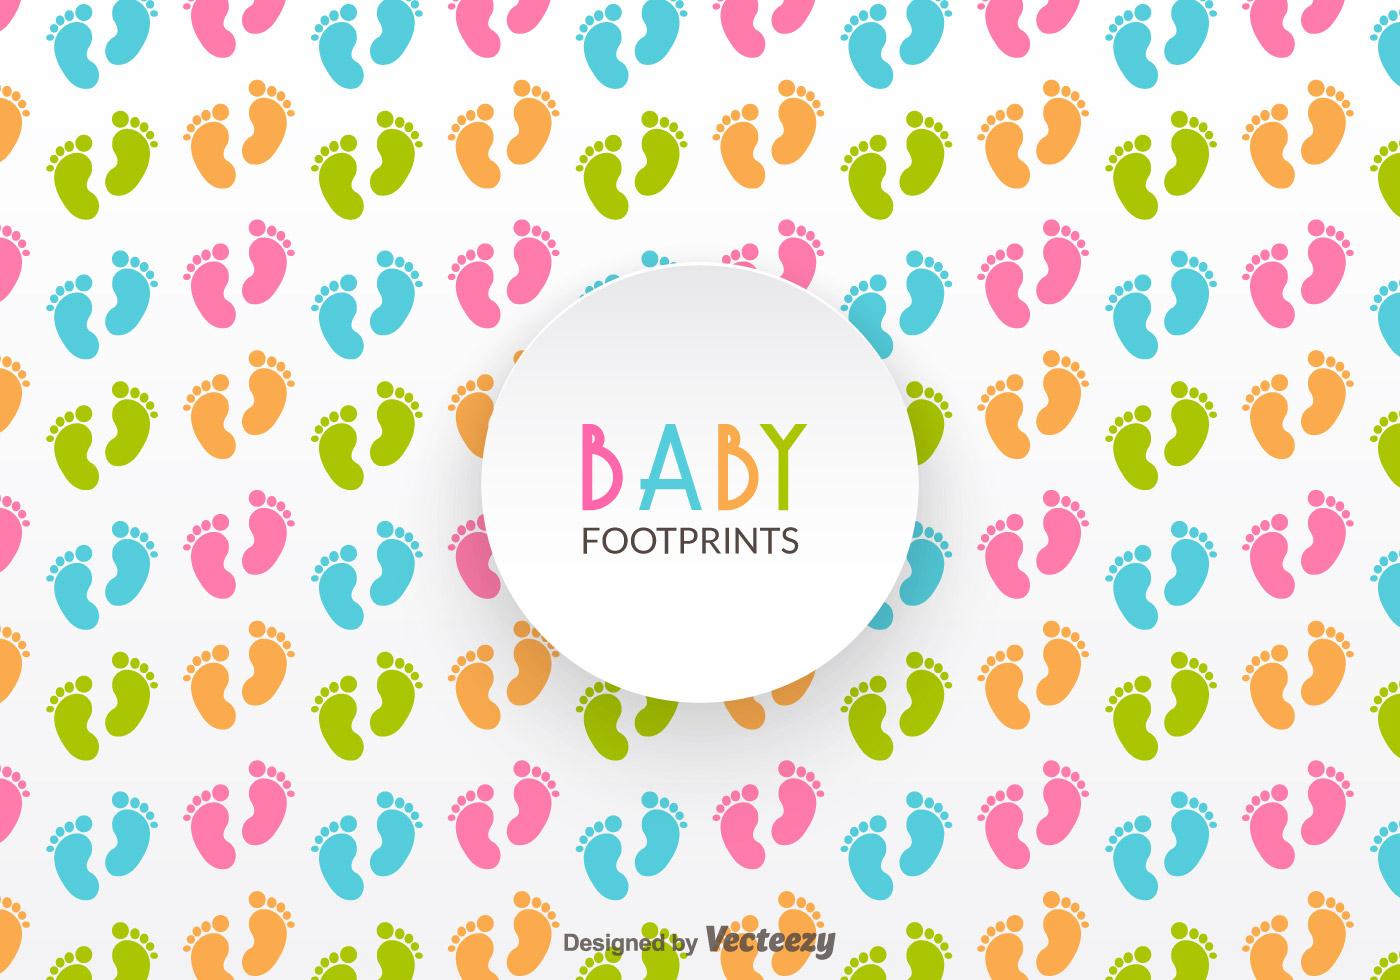 Baby Footprints Vector Pattern Download Free Vector Art